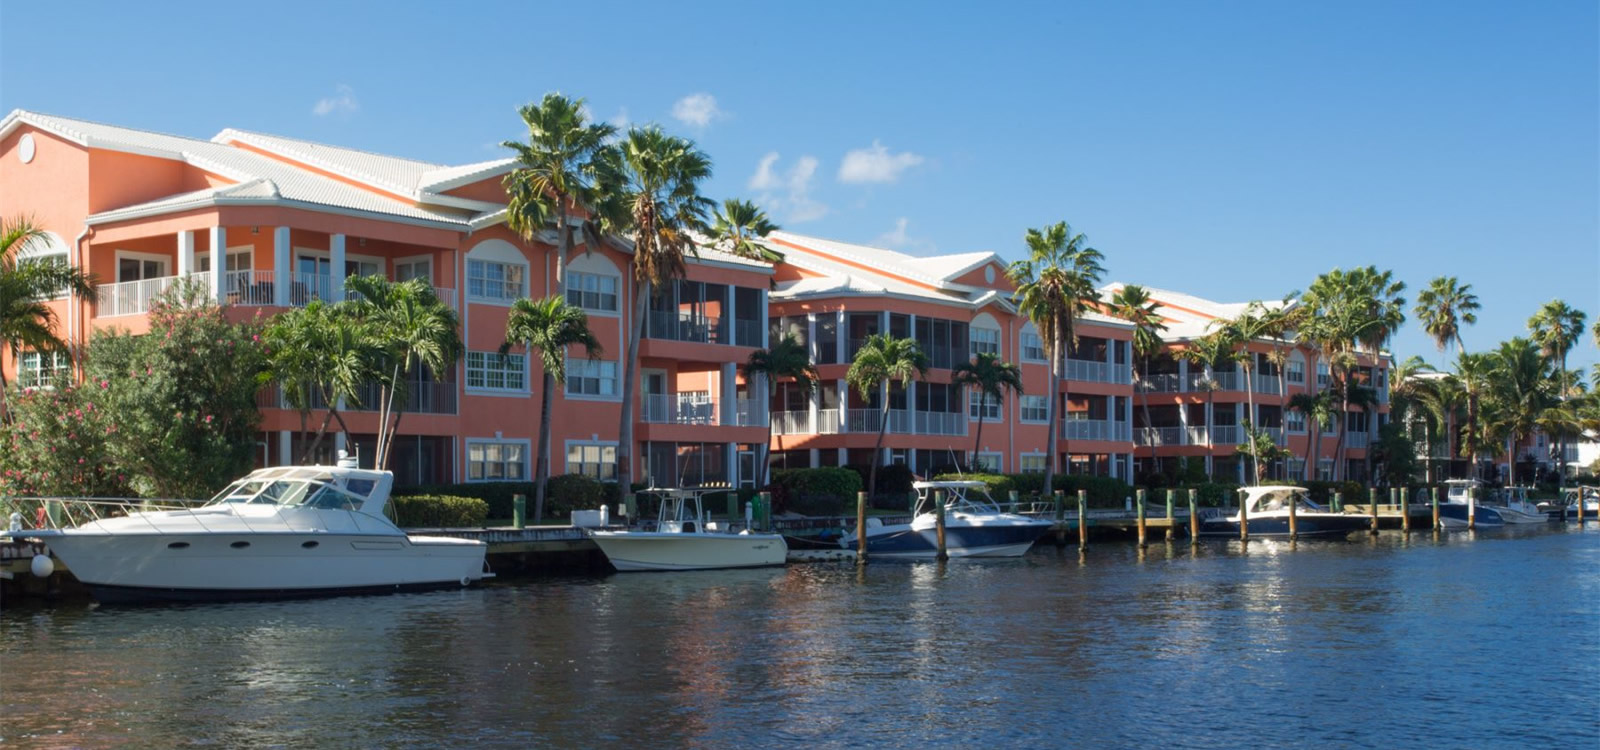 Real Estate Listings Grand Cayman Island